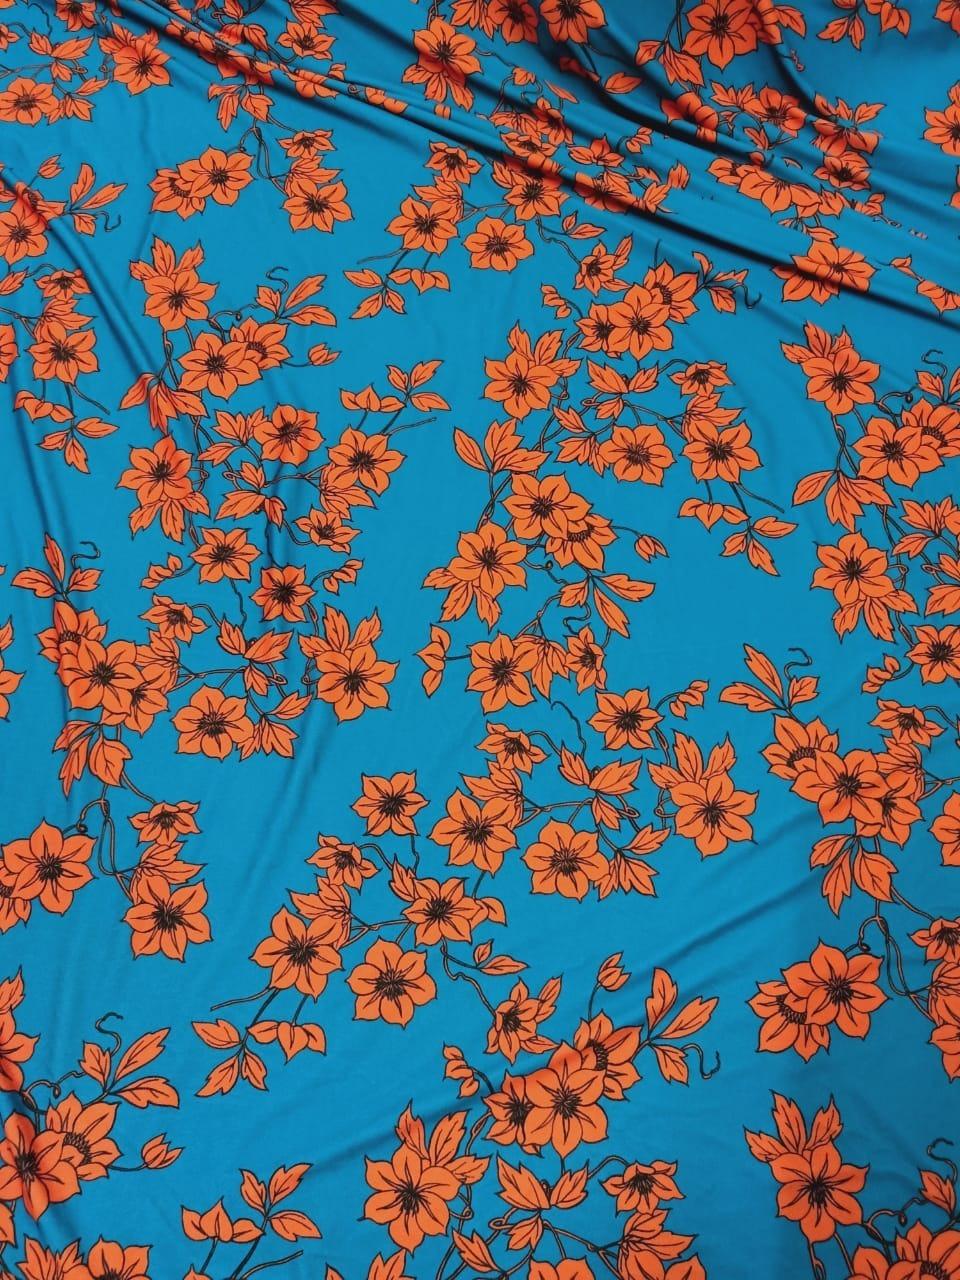 Polyester 4 way Digital Prints fabric